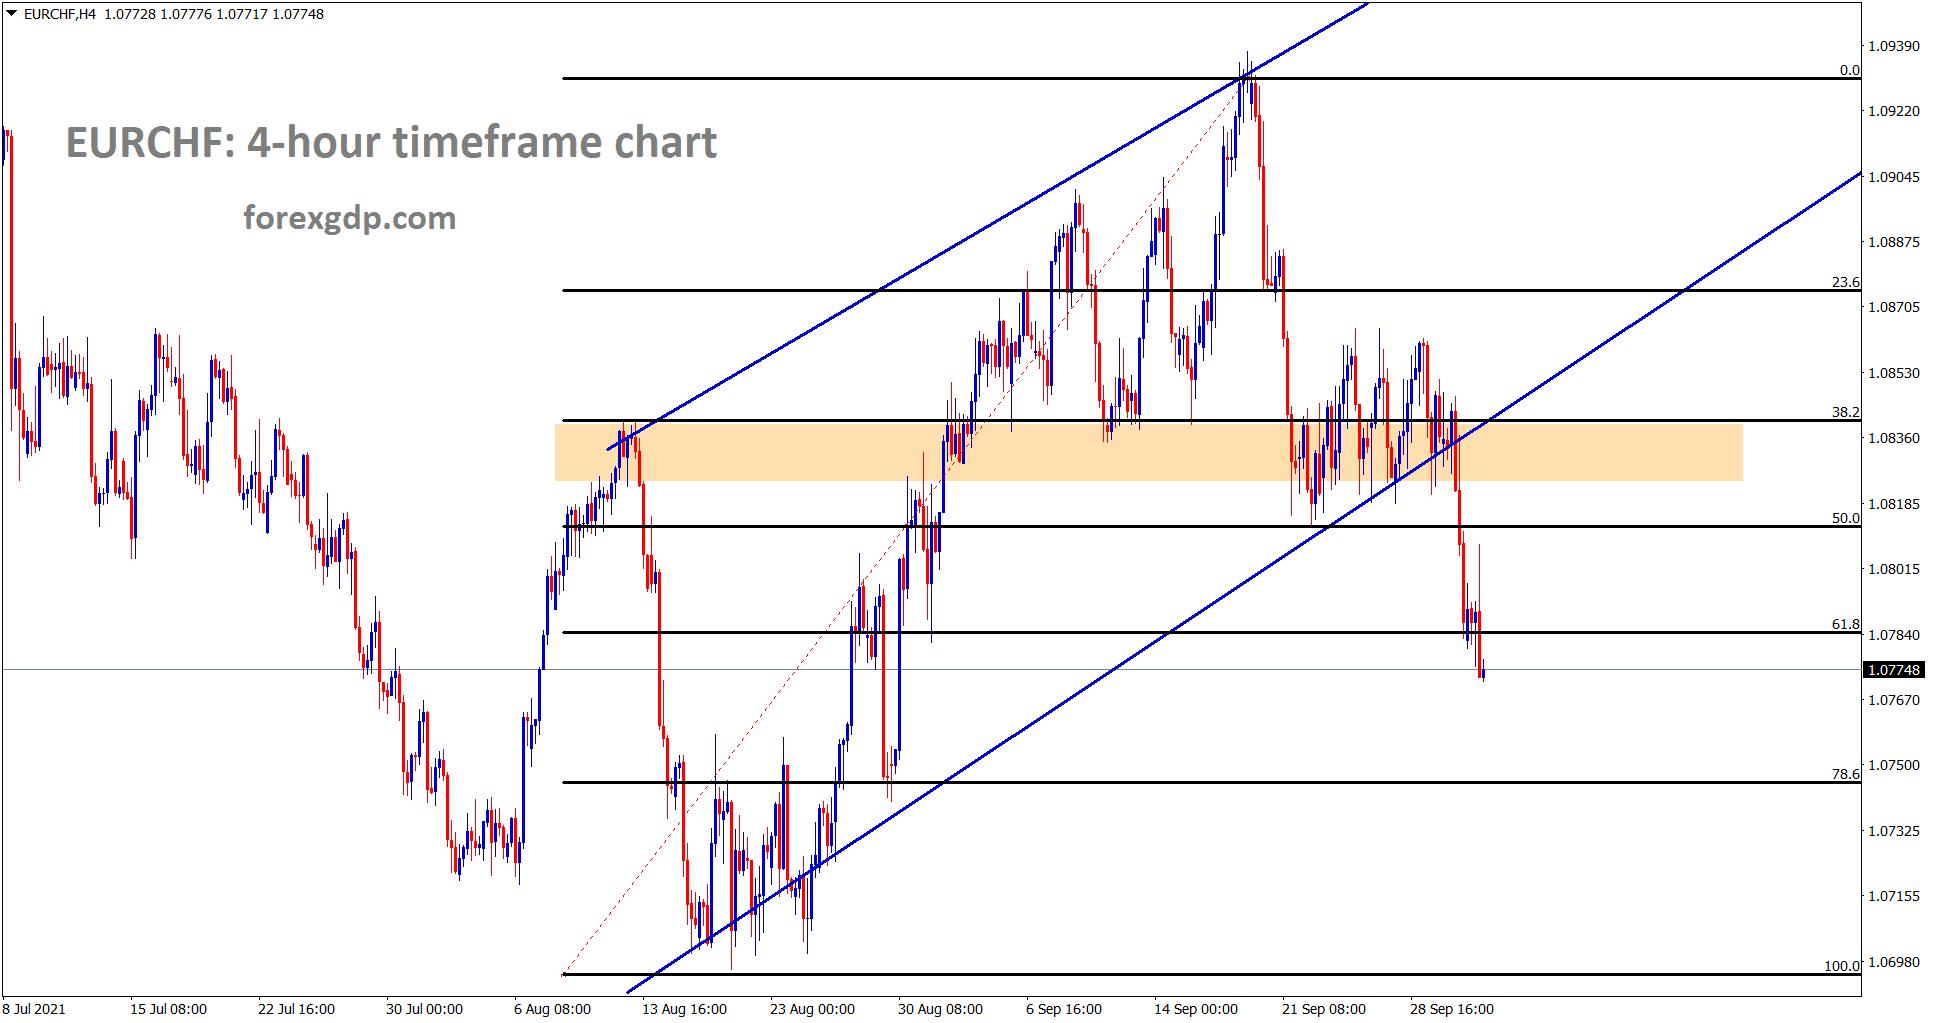 EURCHF has broken the higher low area of the uptrend line